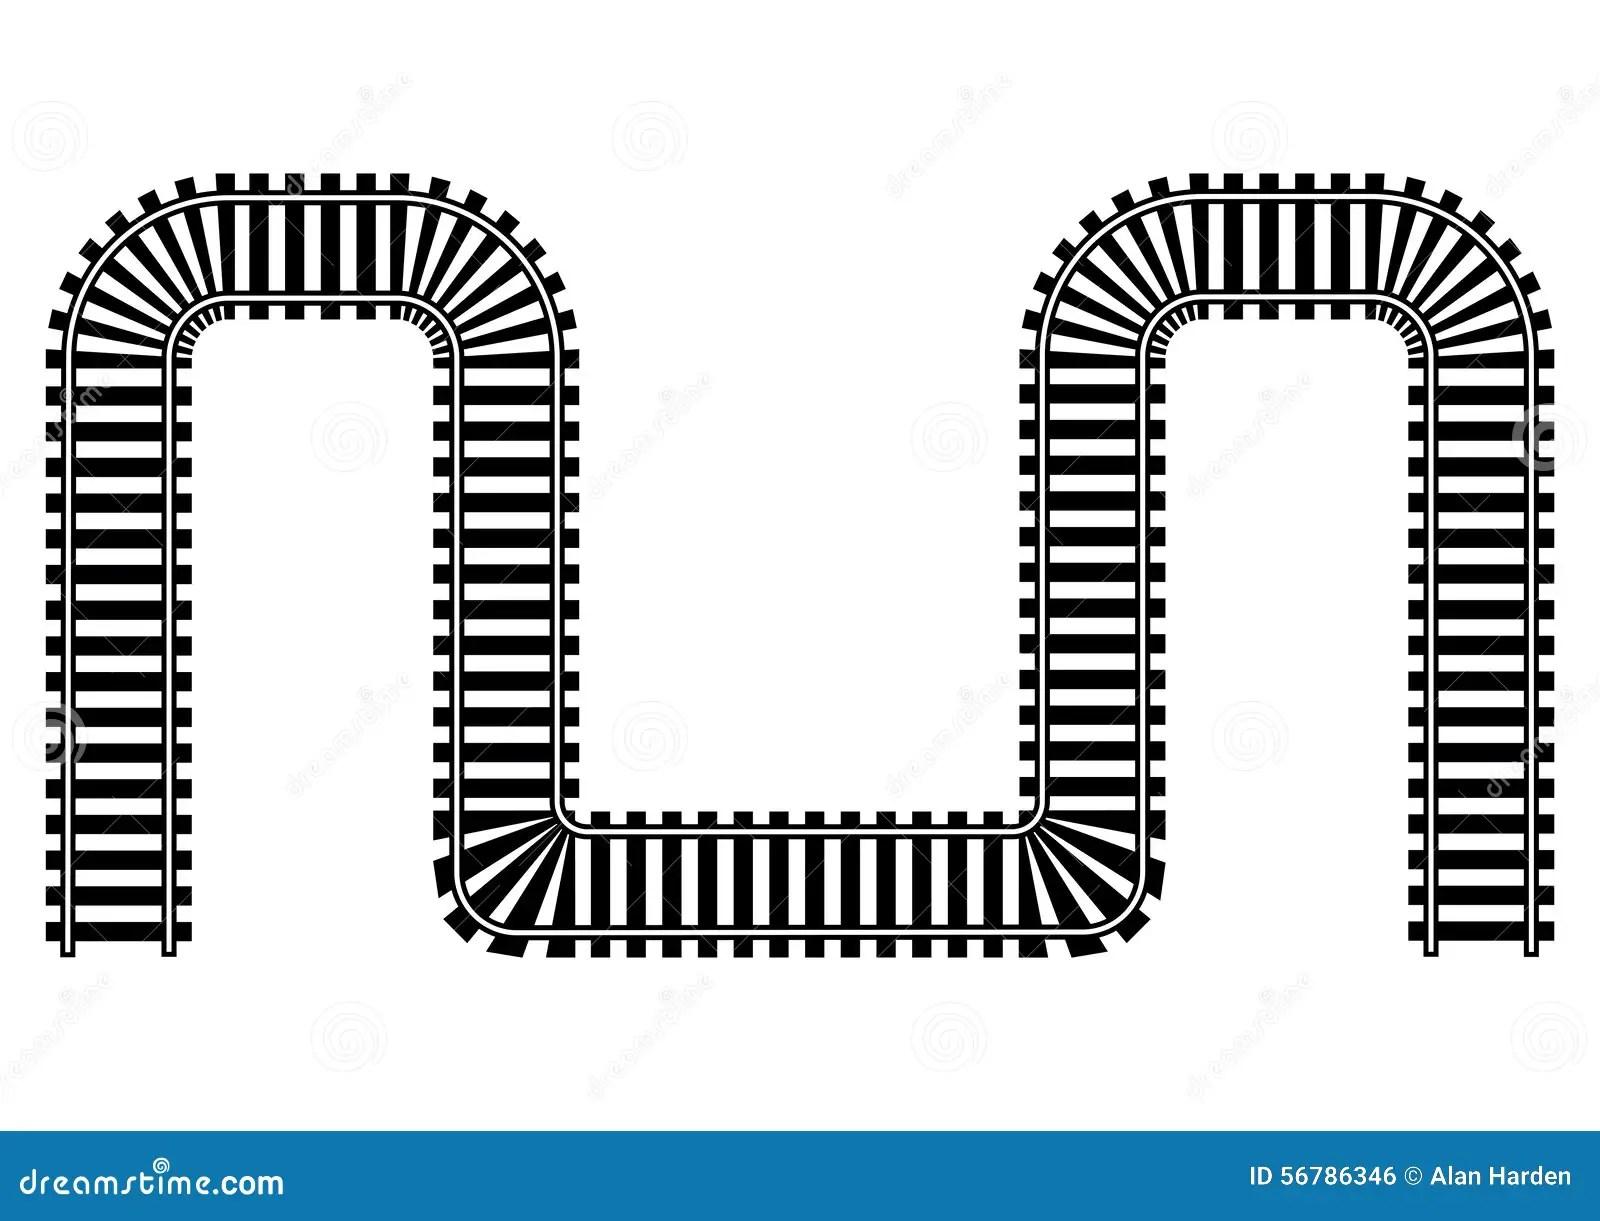 Curved Train Tracks Cartoon